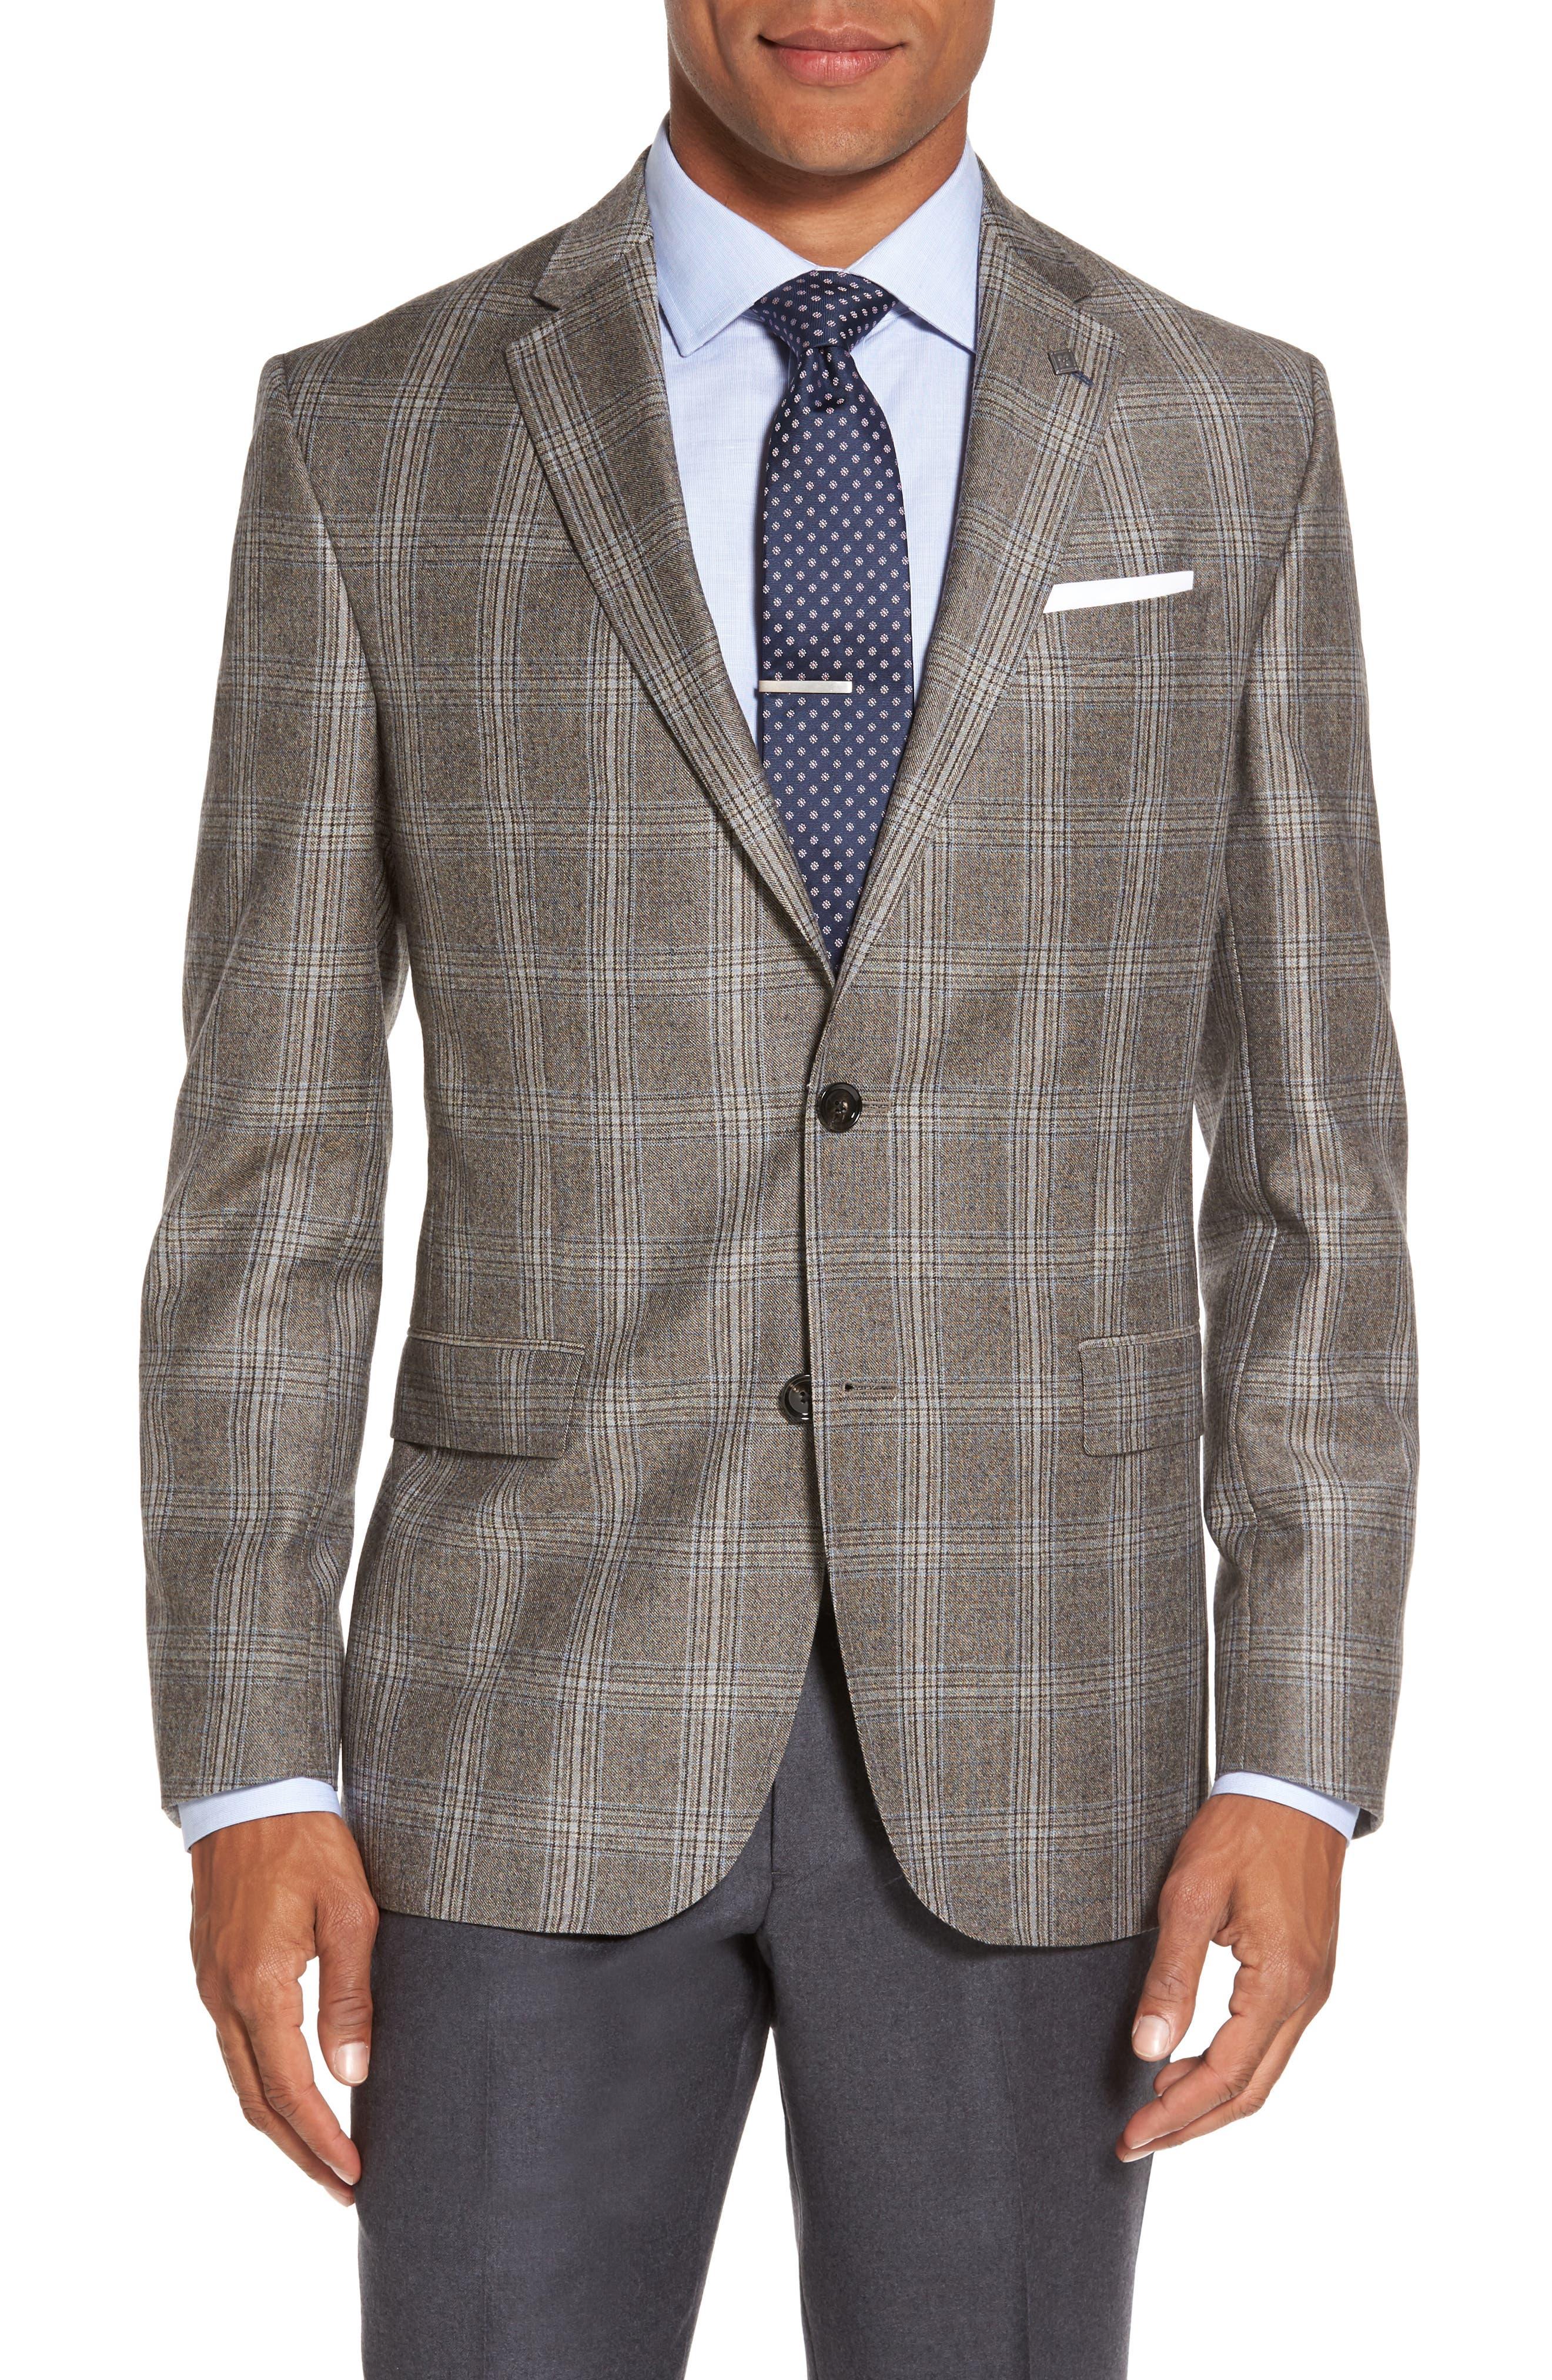 Jay Trim Fit Plaid Wool Sport Coat,                         Main,                         color, 230